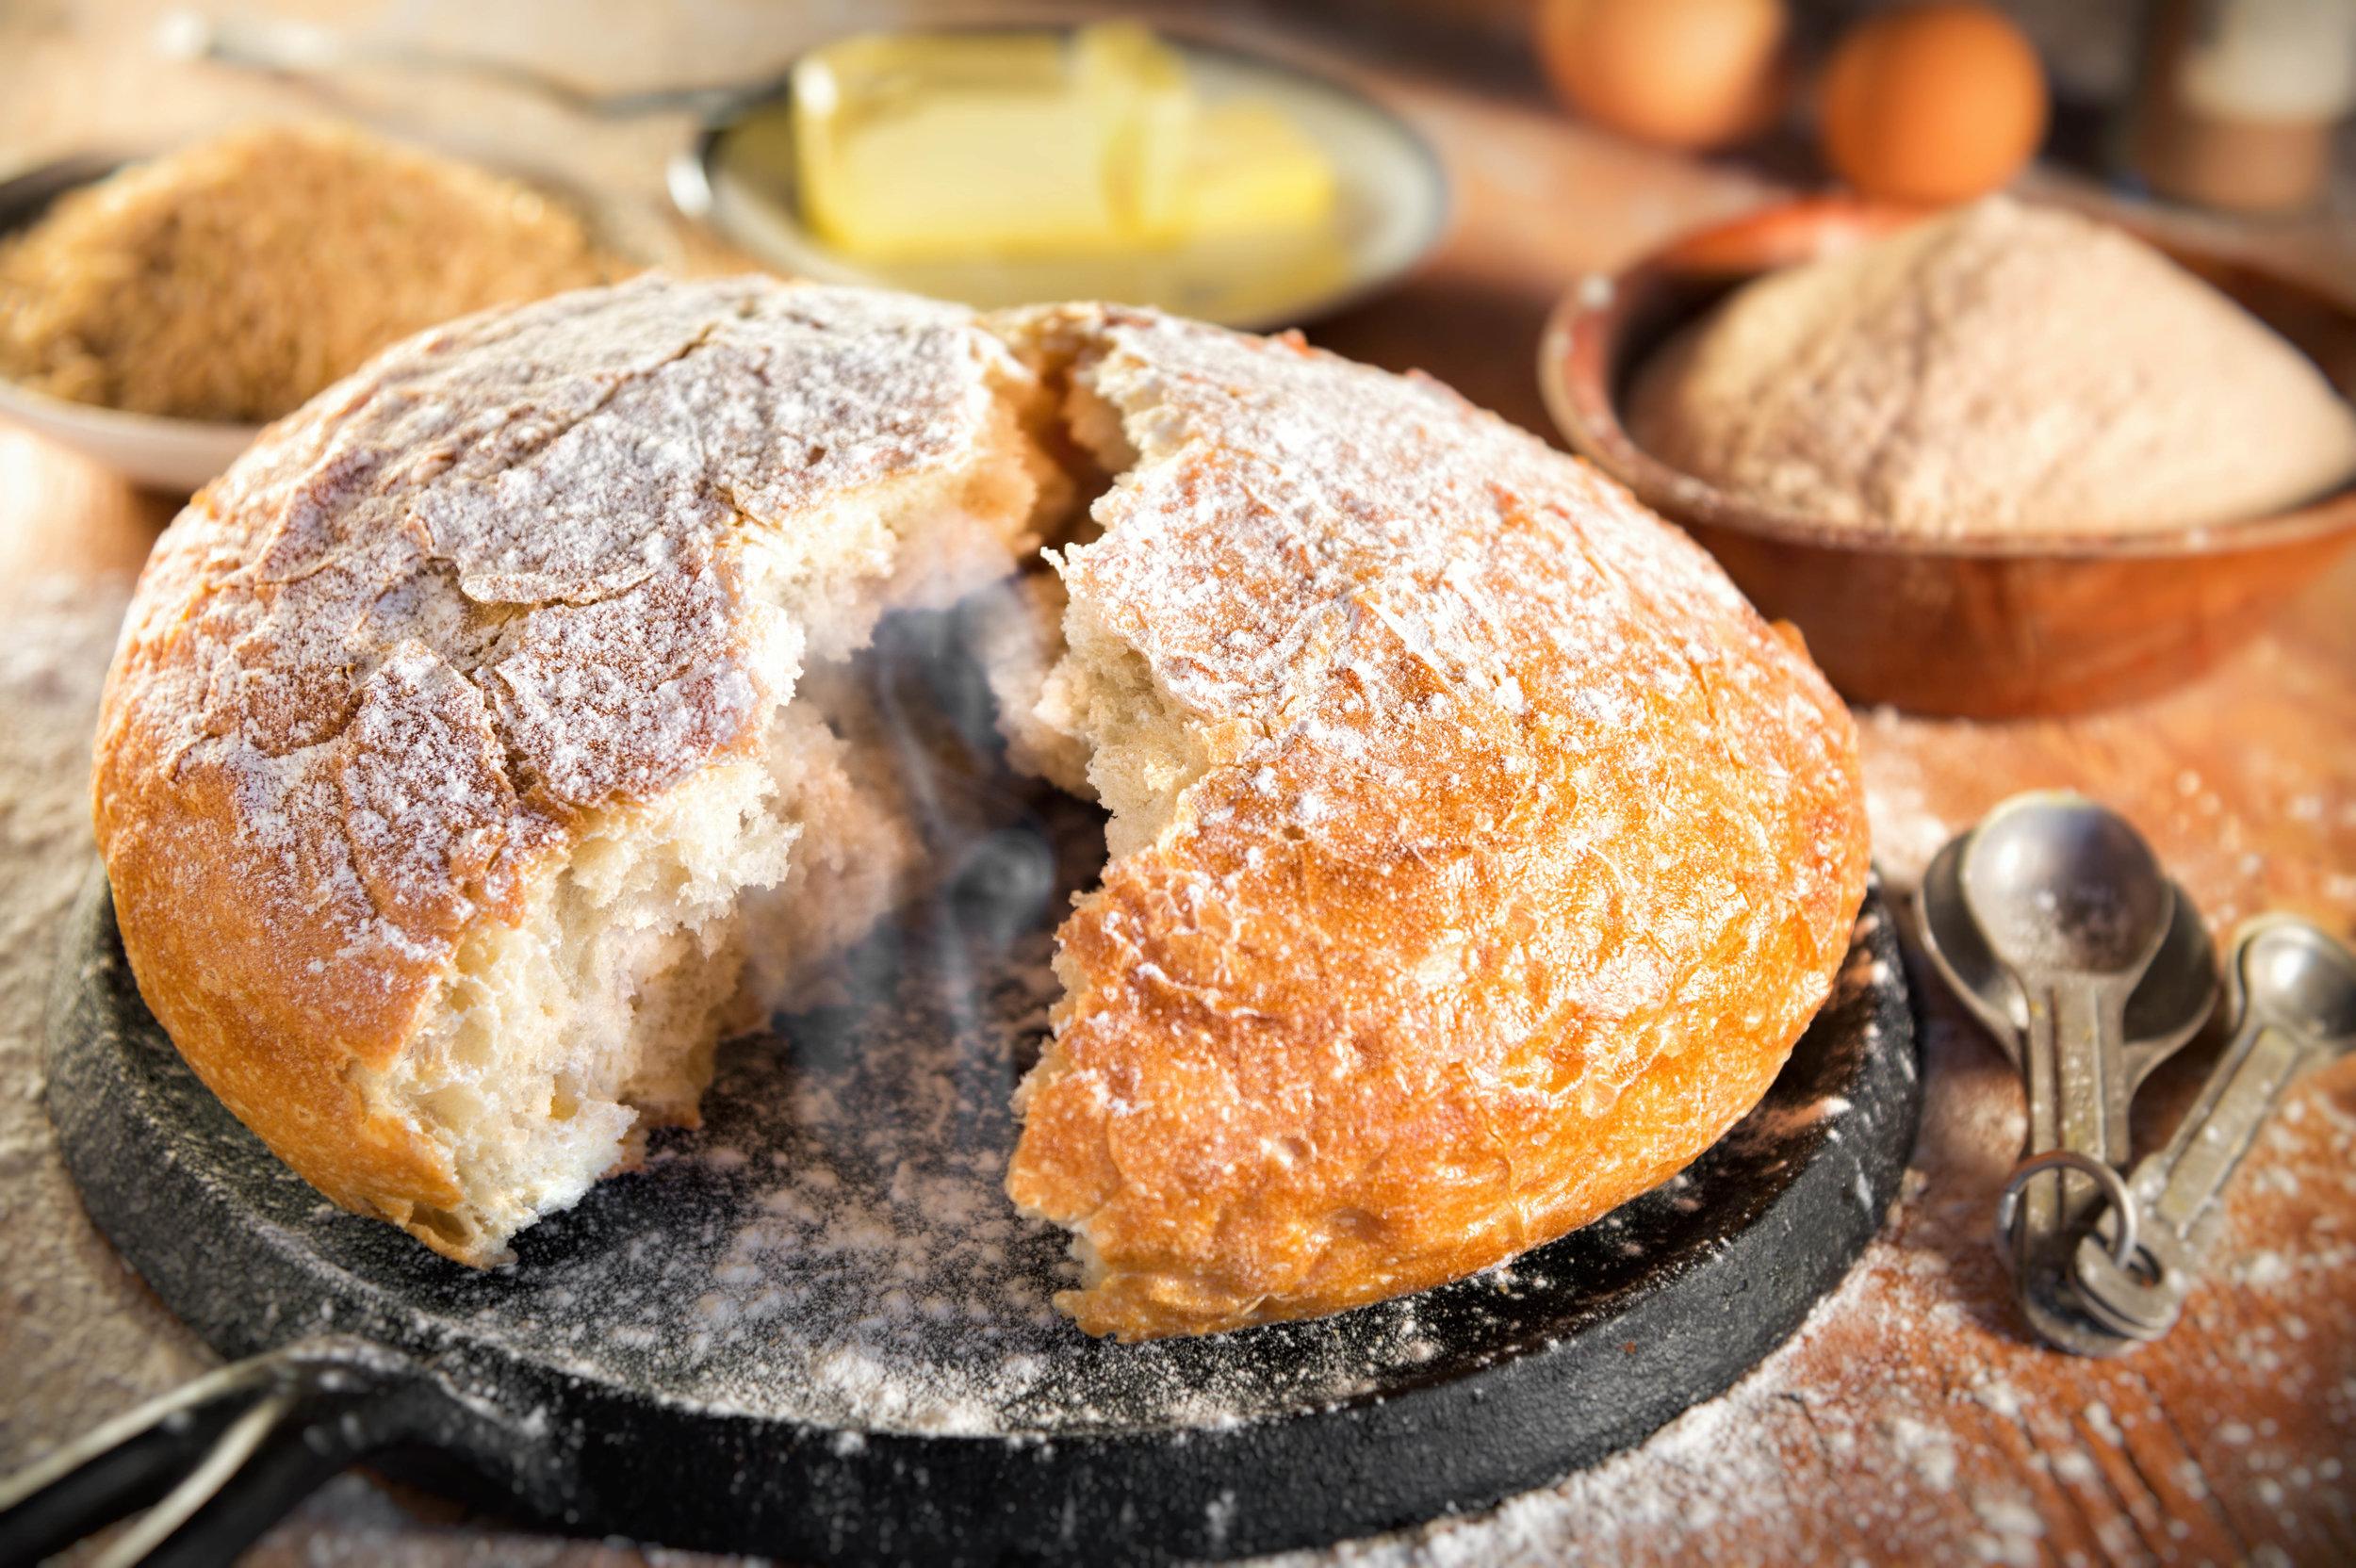 Bread-(Round-and-Cut)sm.jpg